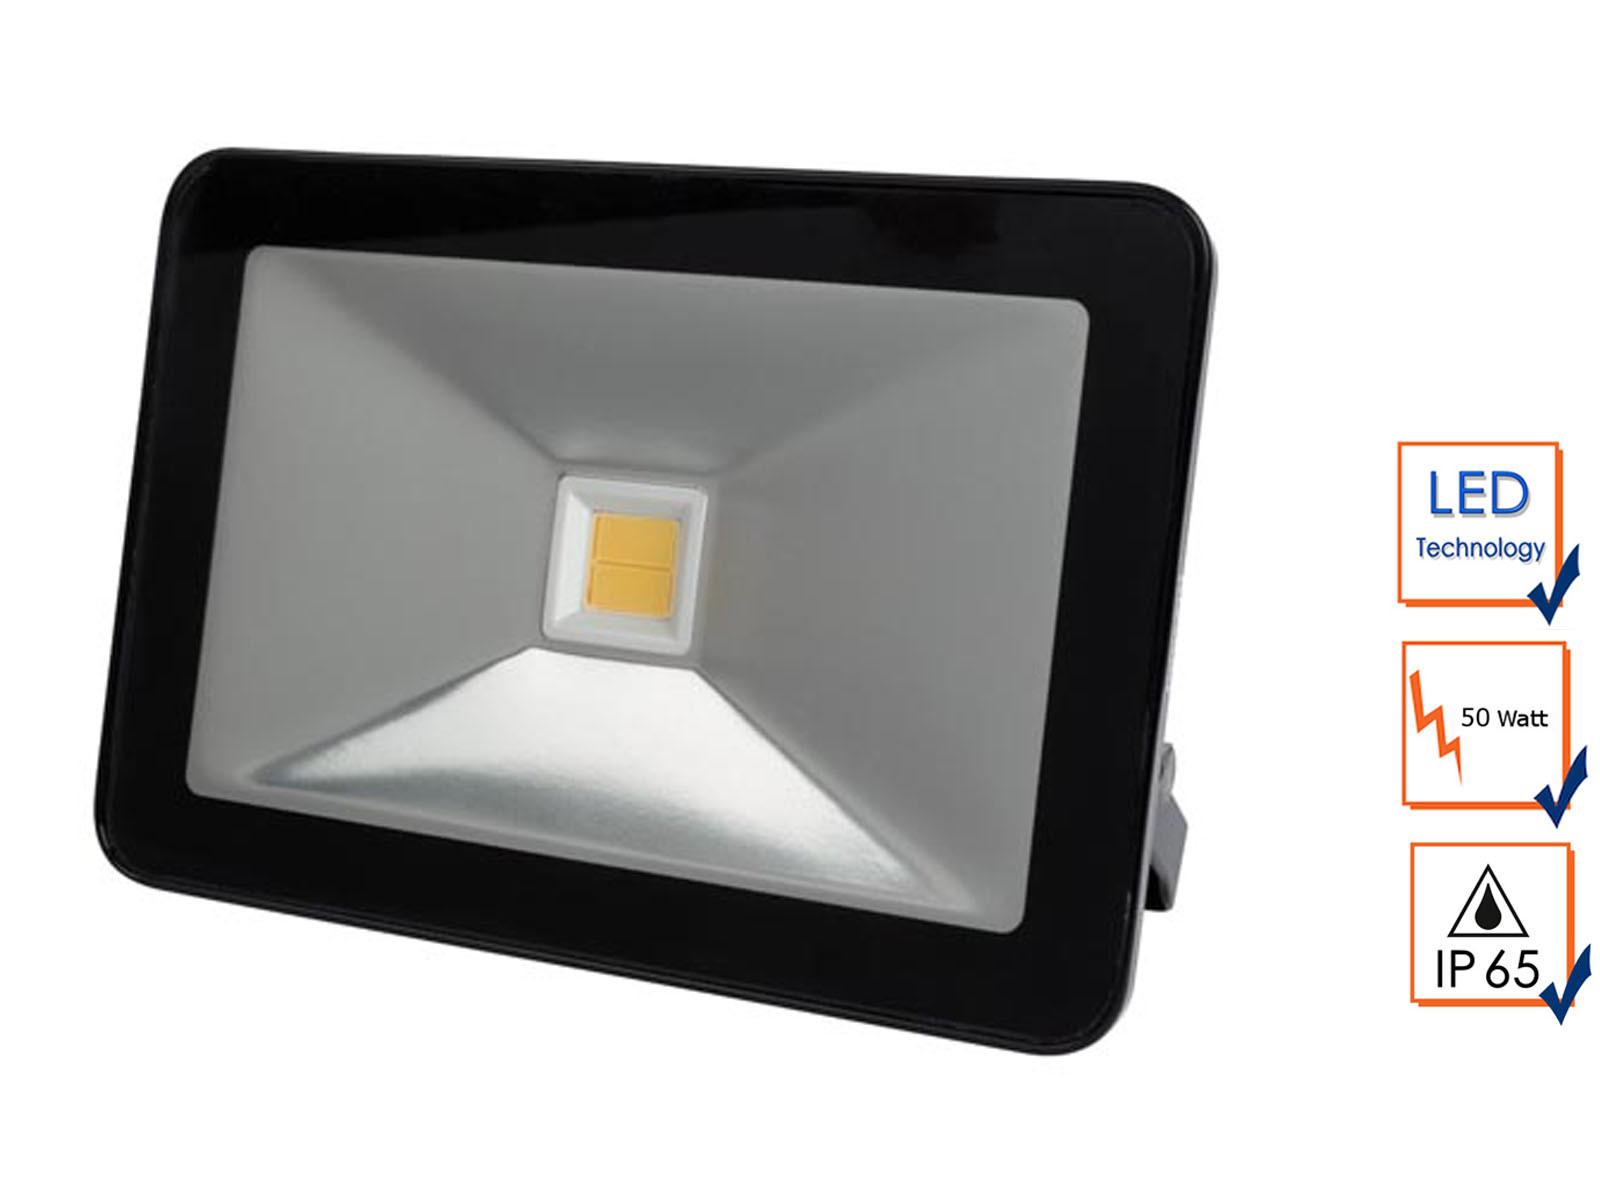 led arbeitslampe flutlicht 50w warmwei scheinwerfer fluter baustrahler ip65 5410329665562 ebay. Black Bedroom Furniture Sets. Home Design Ideas